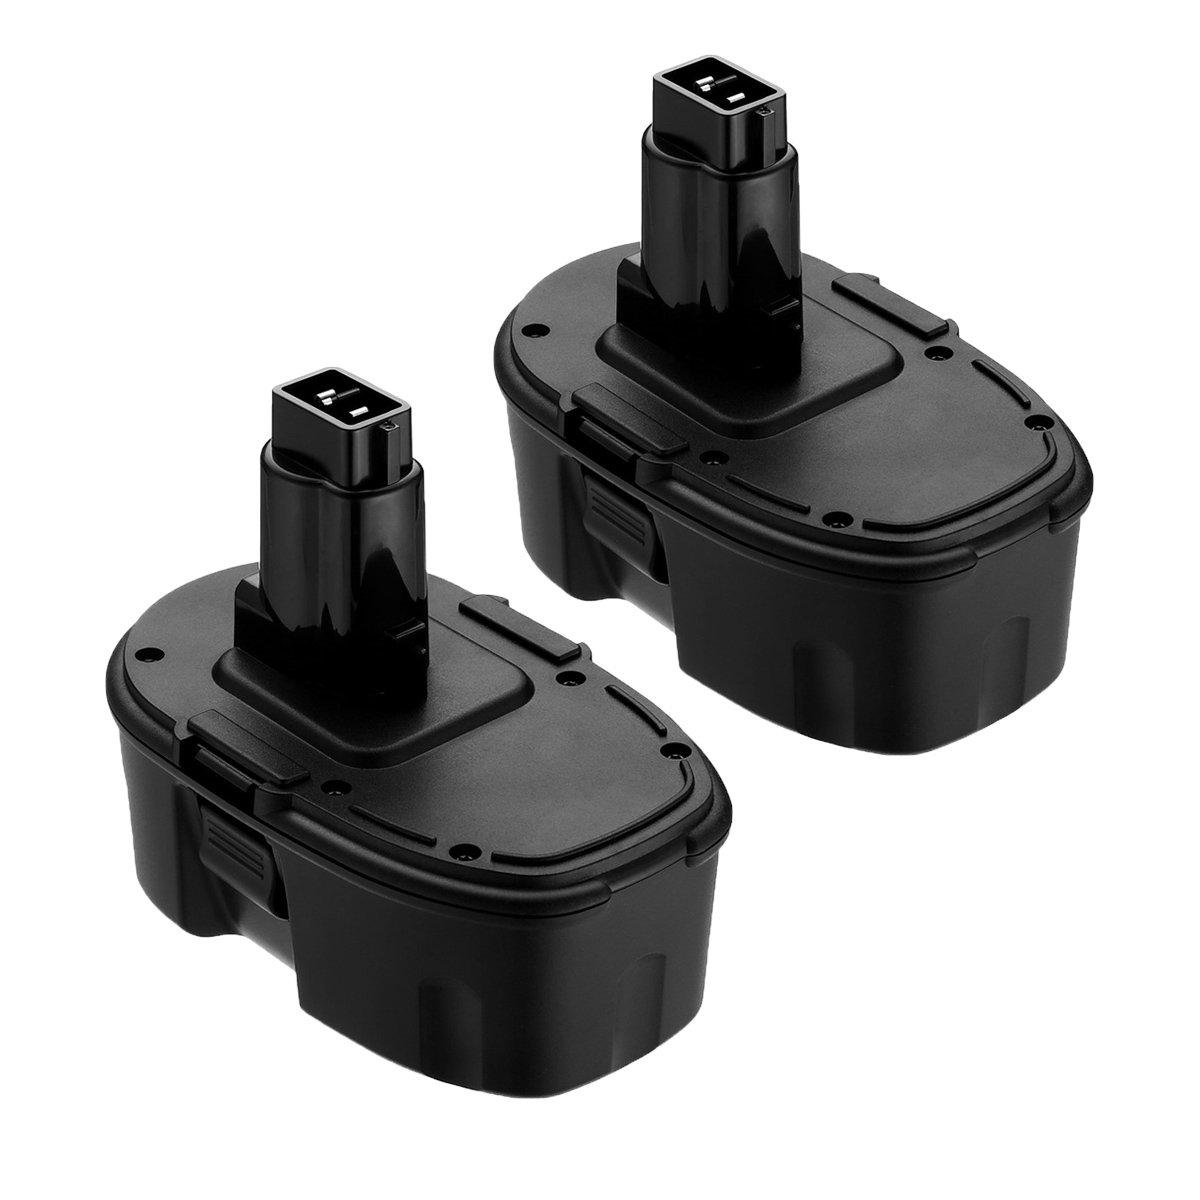 Replace for Dewalt 18V XRP Battery DC9096 DC9099 DC9098 DW9099 DW9098 Compatible Replacement Cordless Power Tools Batteries(2-Packs)